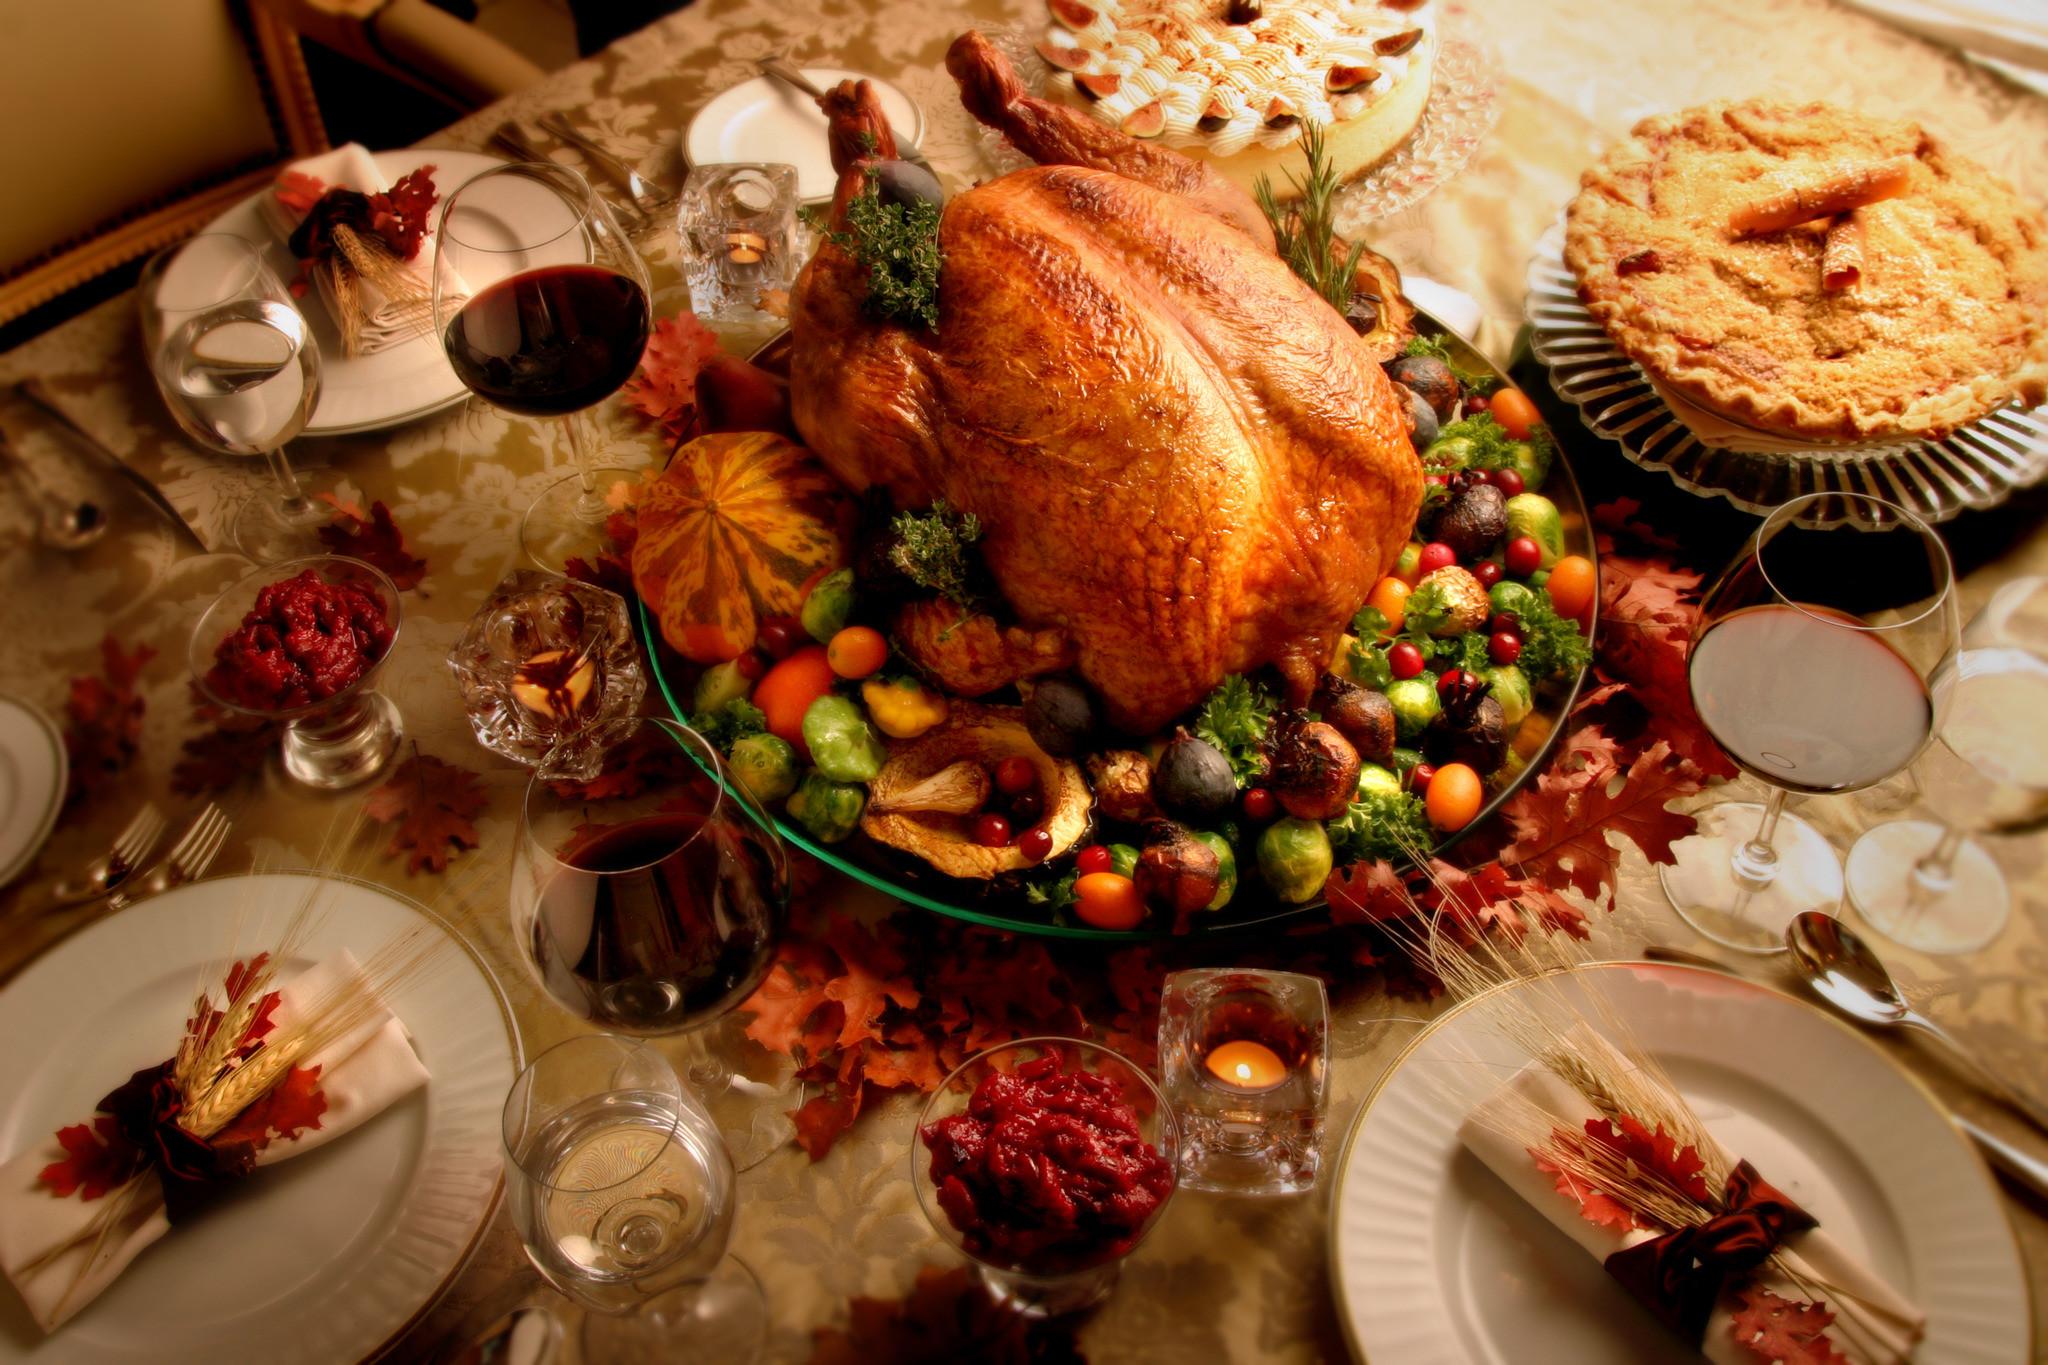 Thanksgiving Breakfast Restaurants  November 2018 events calendar for Los Angeles